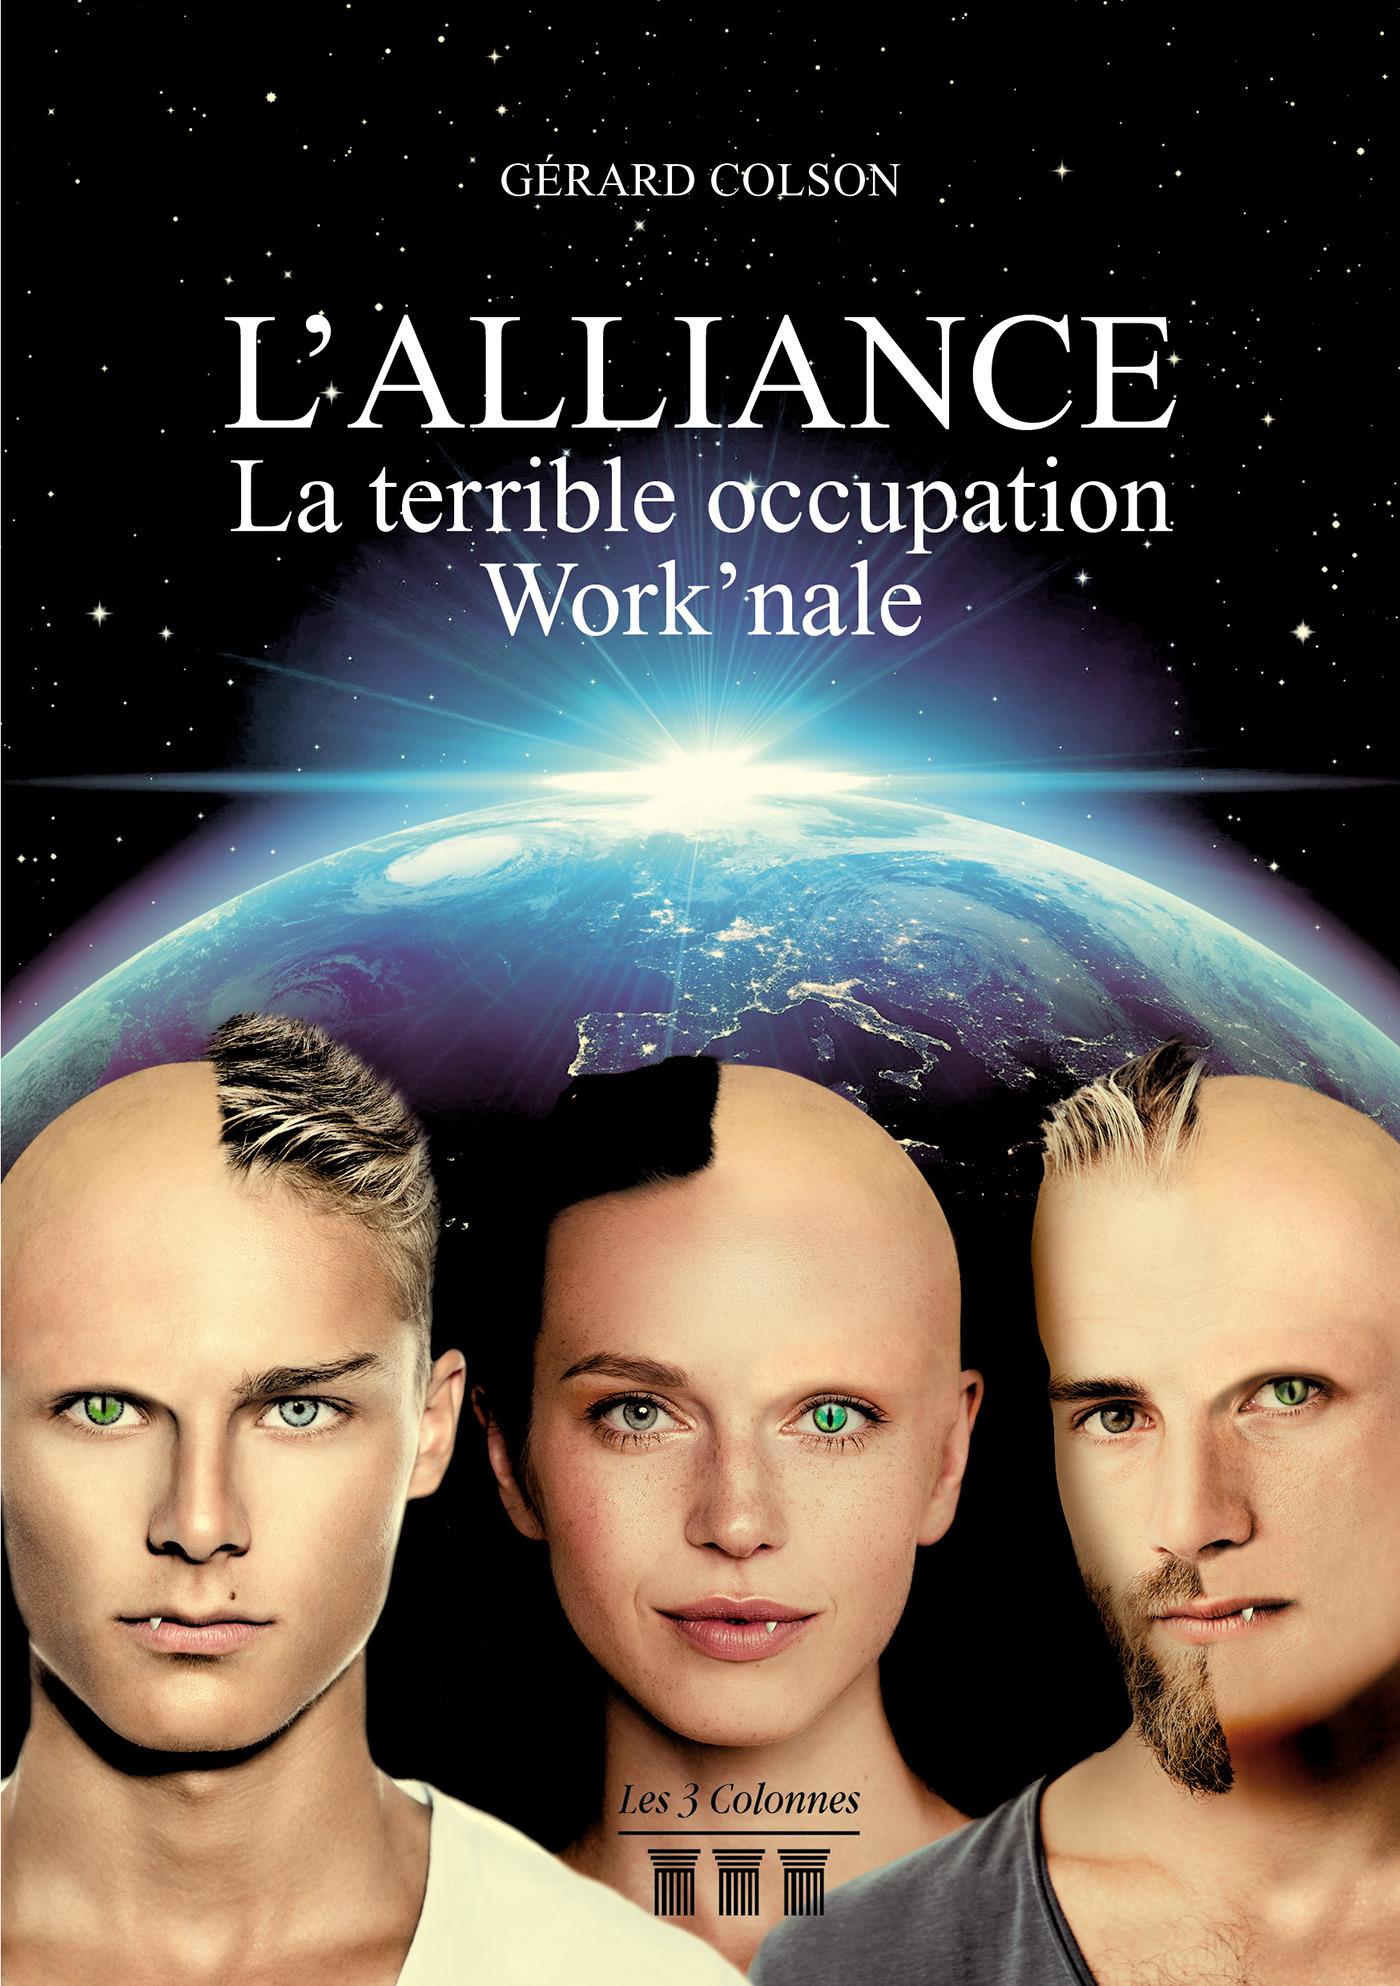 L'Alliance - La terrible occupation Work'nale  - Gerard Colson